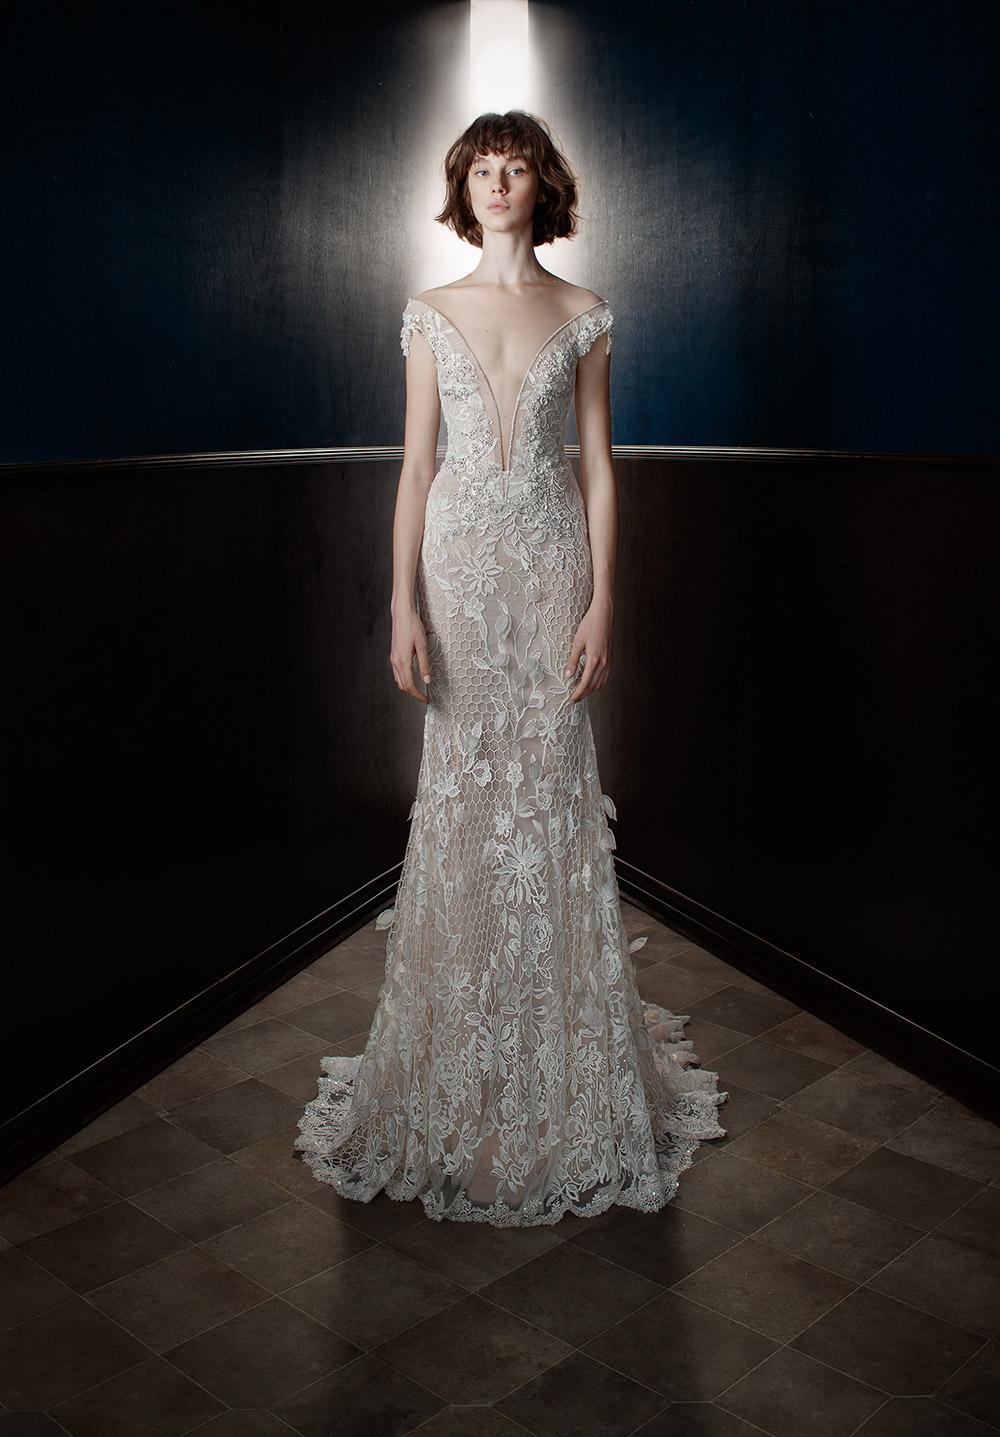 Lia - Galia Lahav Spring 2018 Bridal Collection. www.theweddingnotebook.com